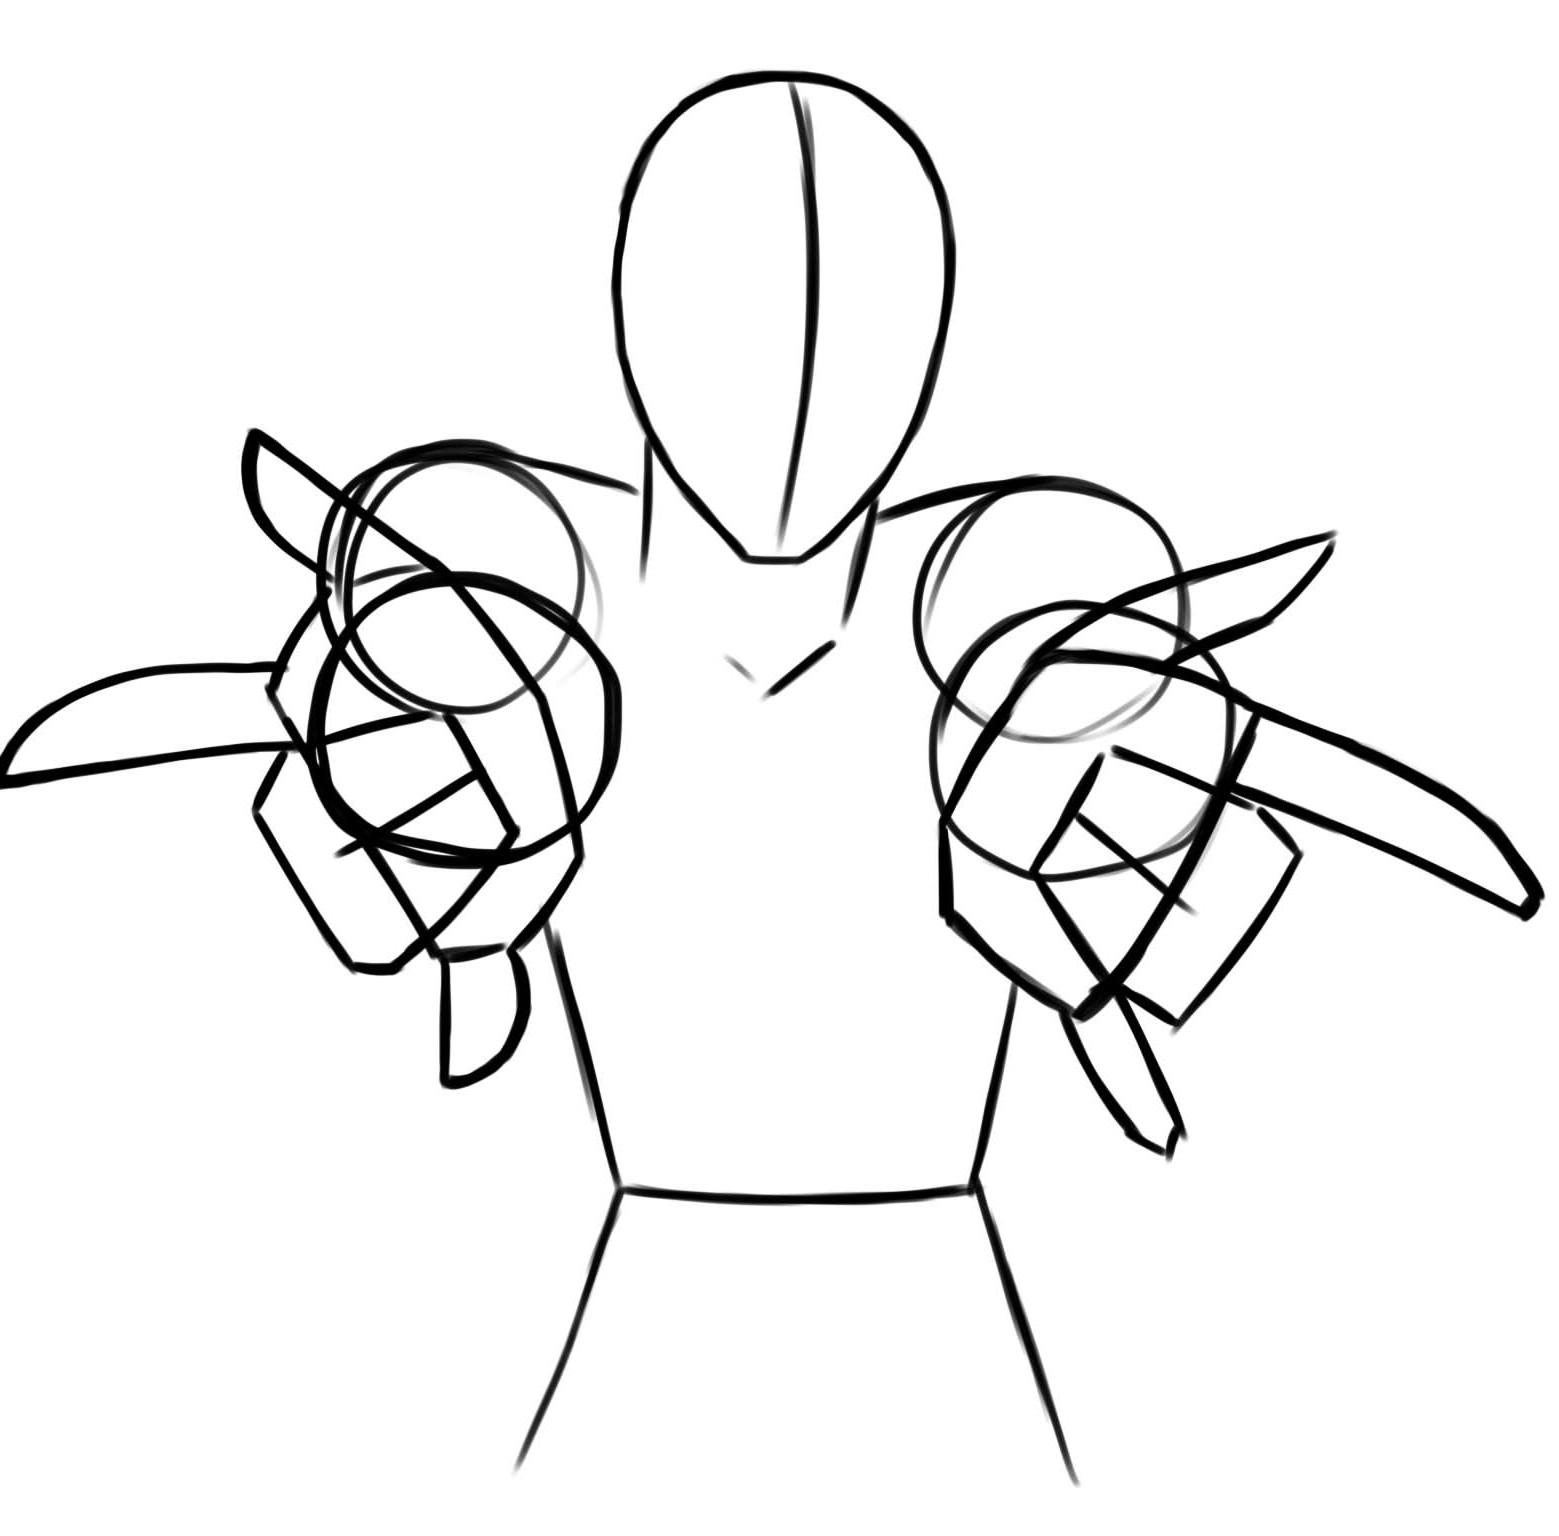 Esquemas para dibujar paso a paso a spiderman devian for Dormitorio para dibujar facil